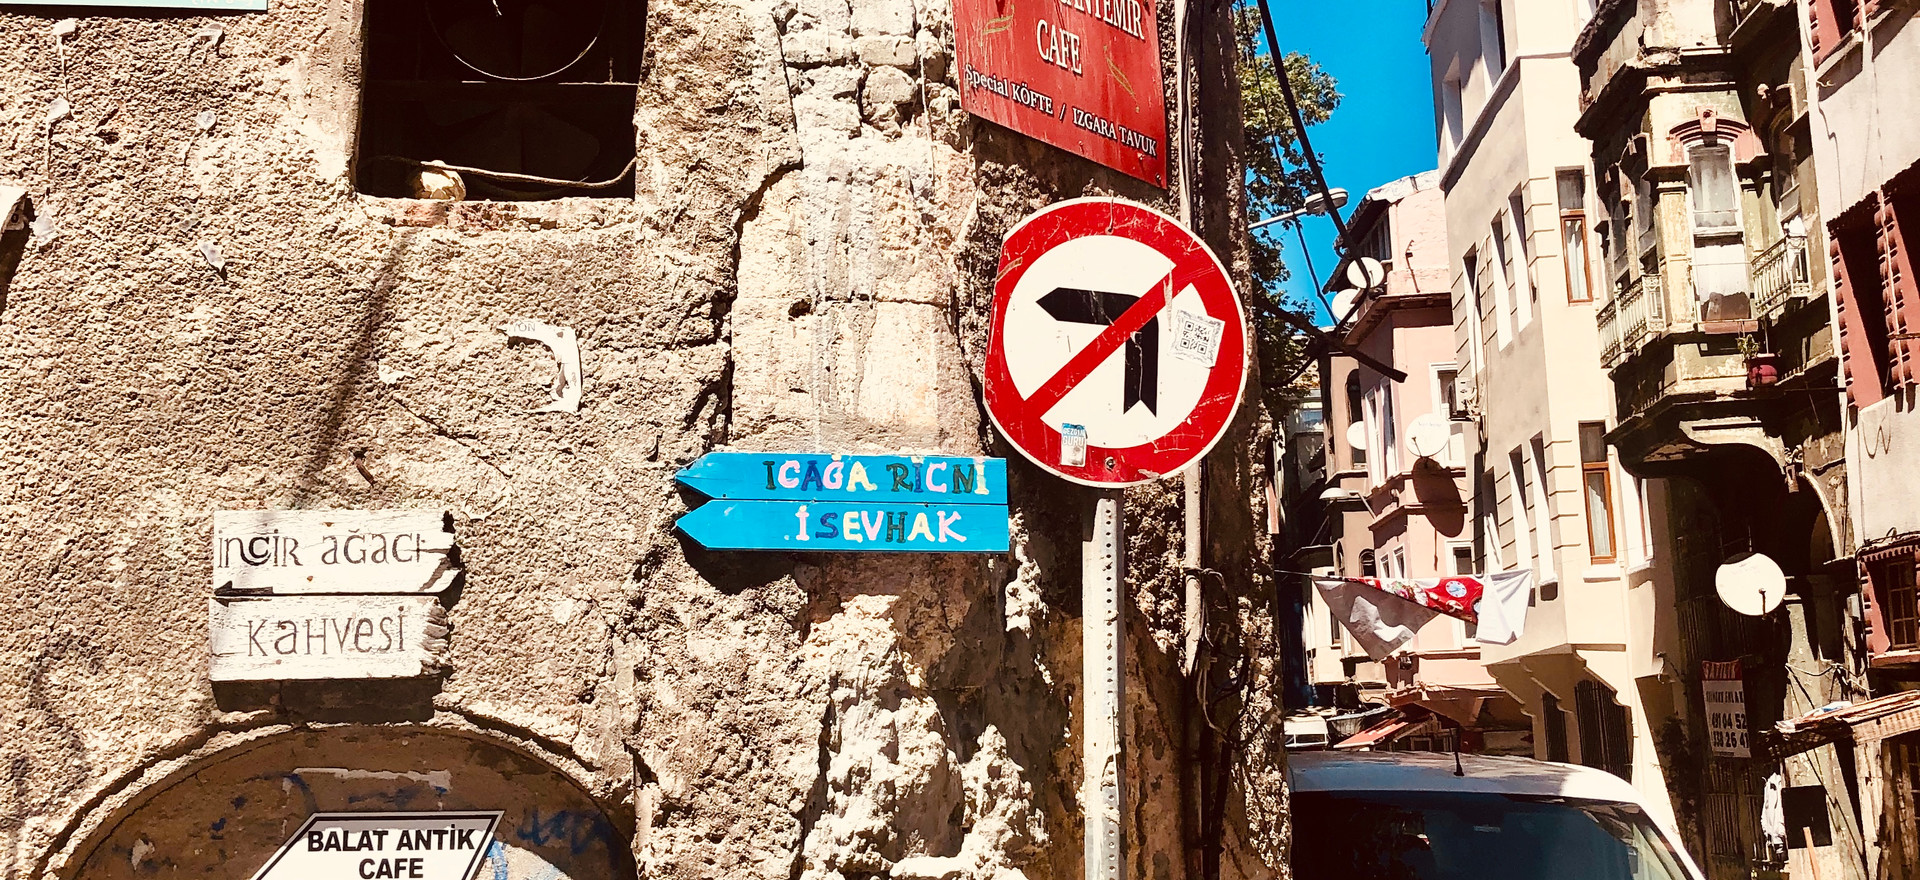 Balat - Istanbul's Old Gipsy Area